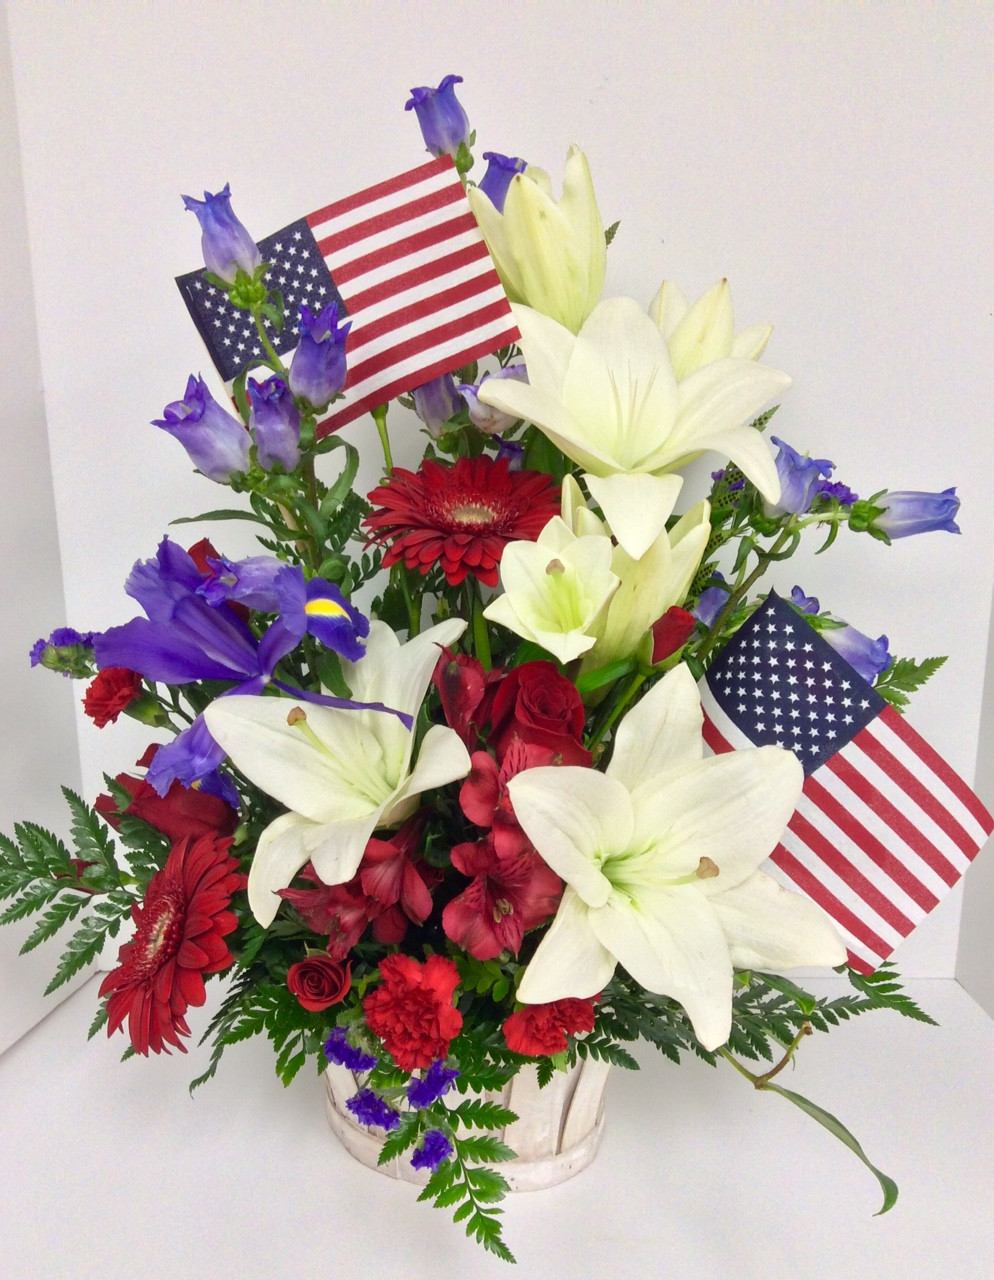 Red, White, and Blue Fresh Basket Arrangement - Centerville Florists